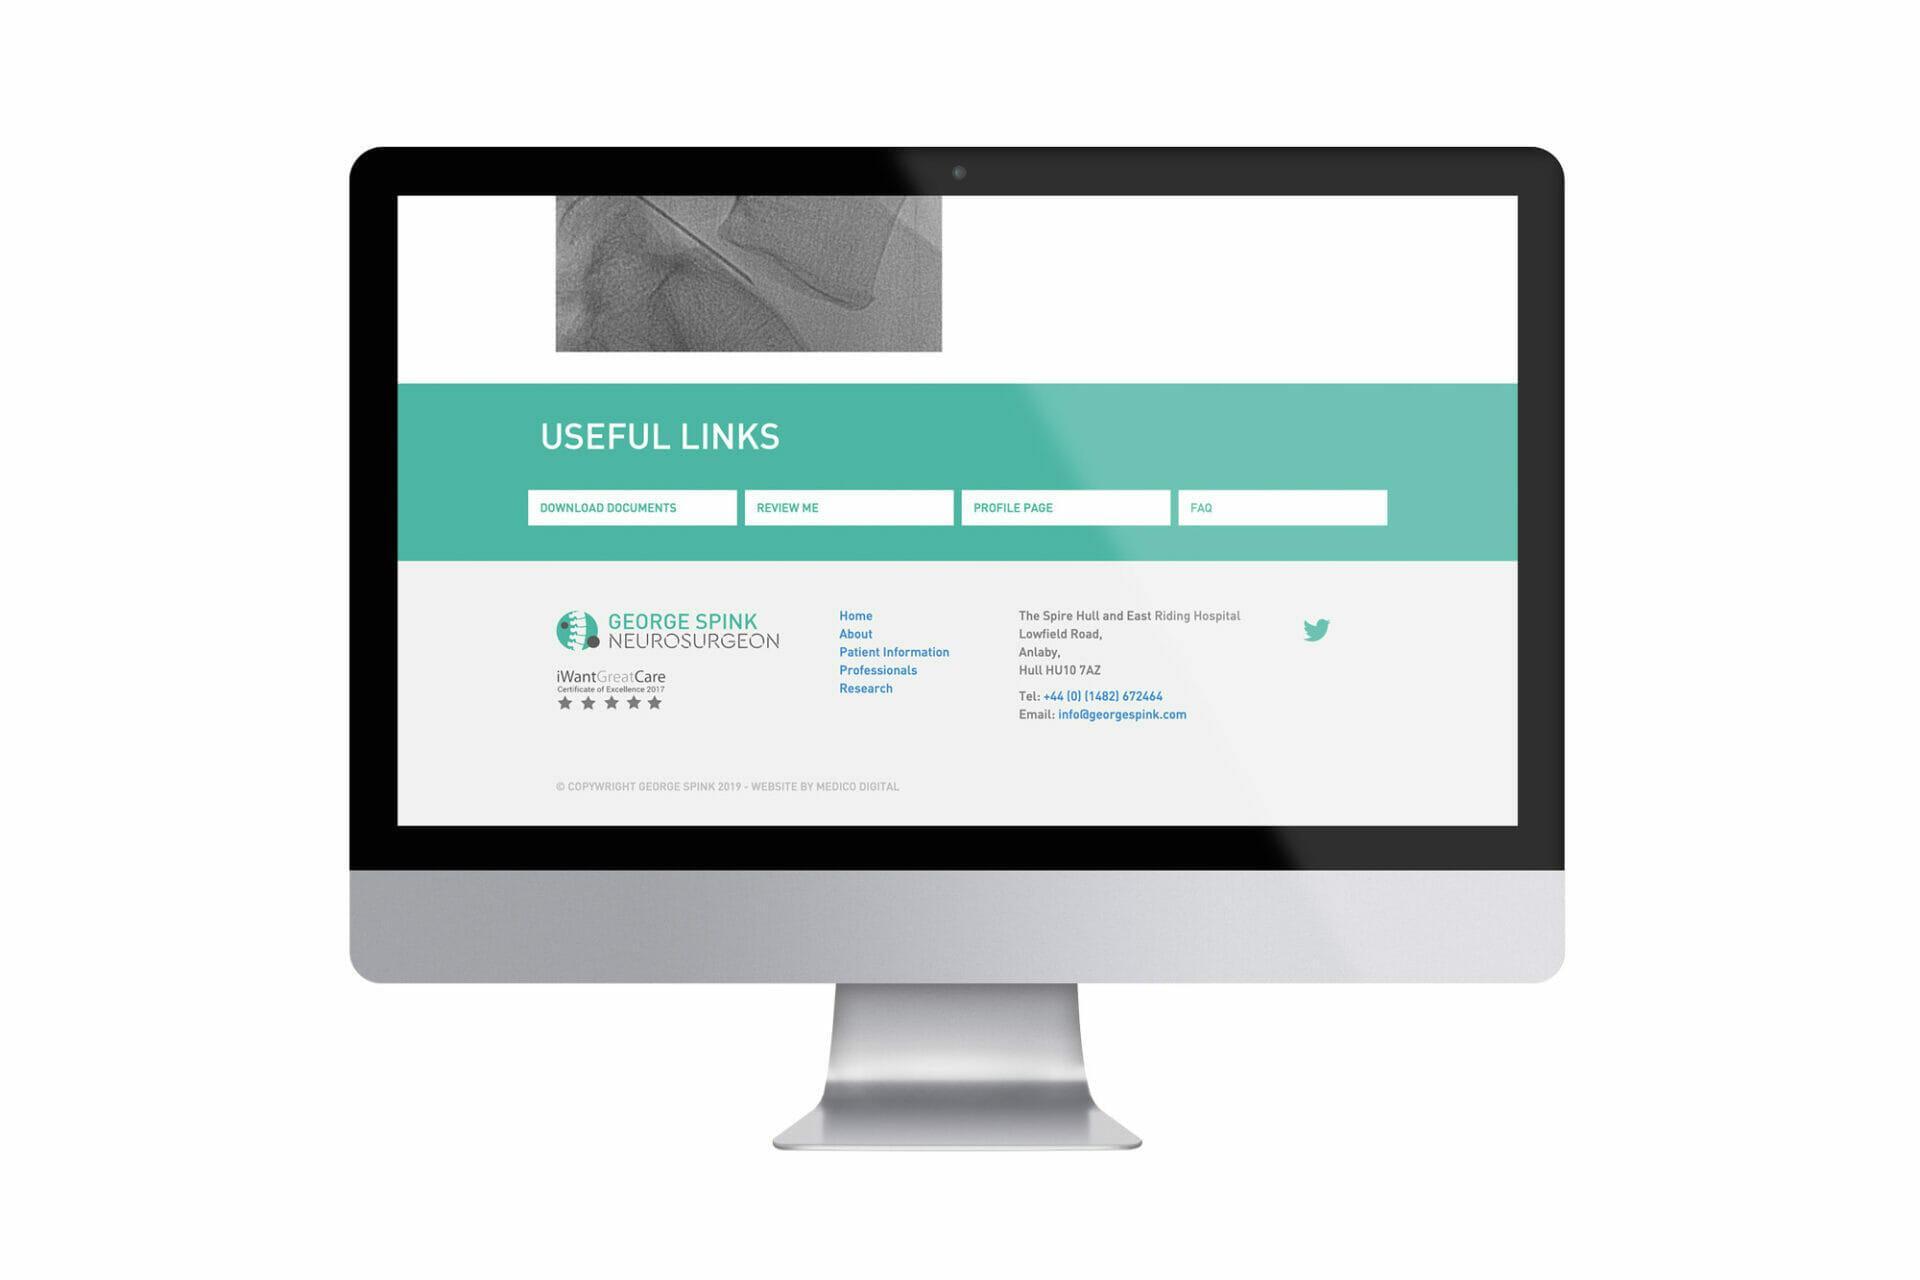 George Spink Website example on Mac